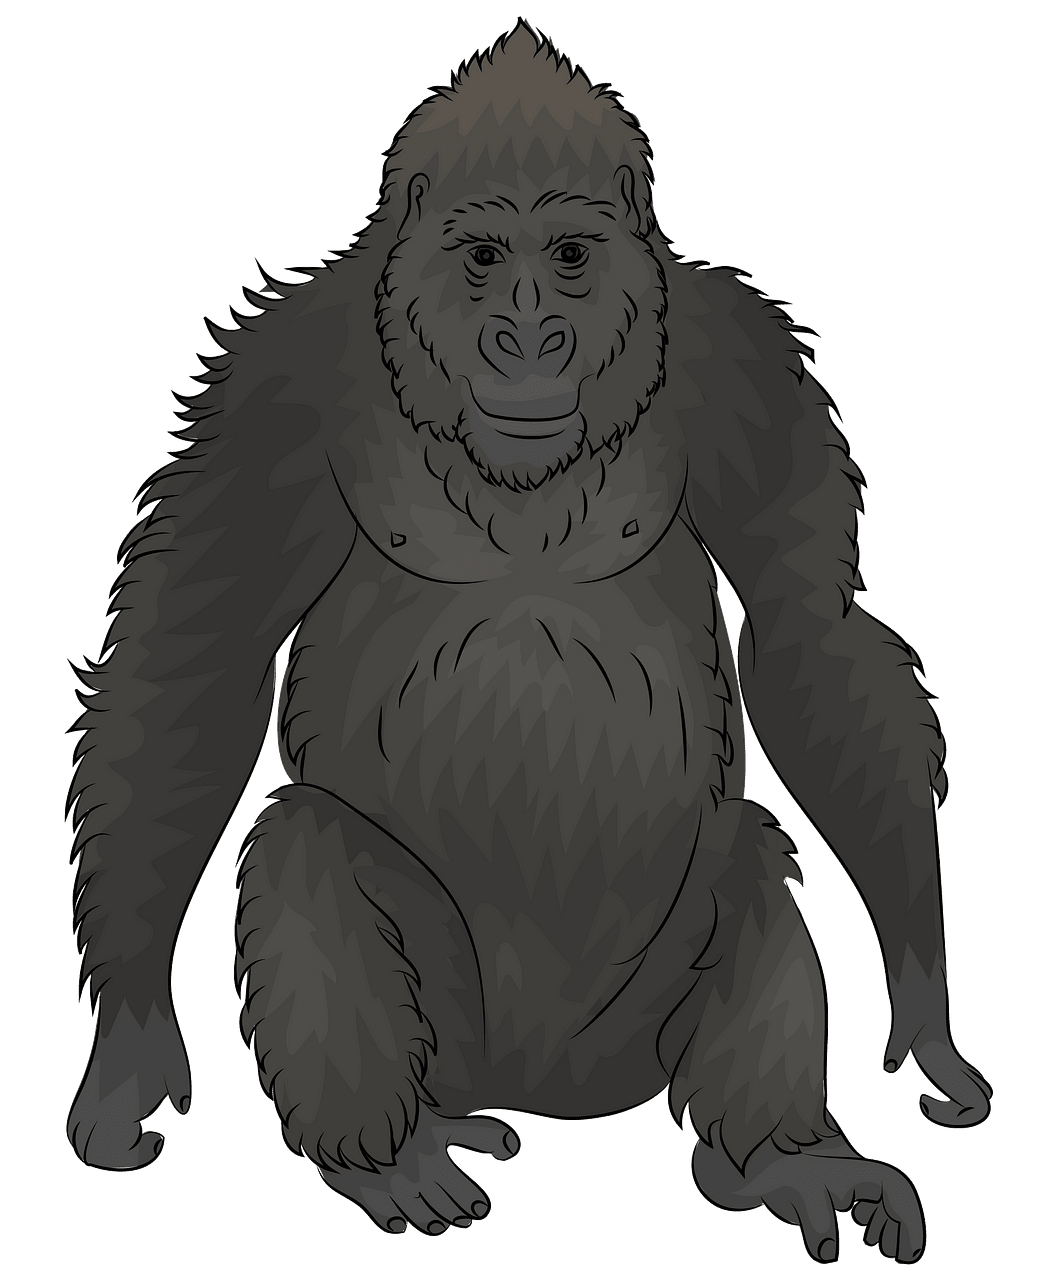 Gorilla clipart. Free download..